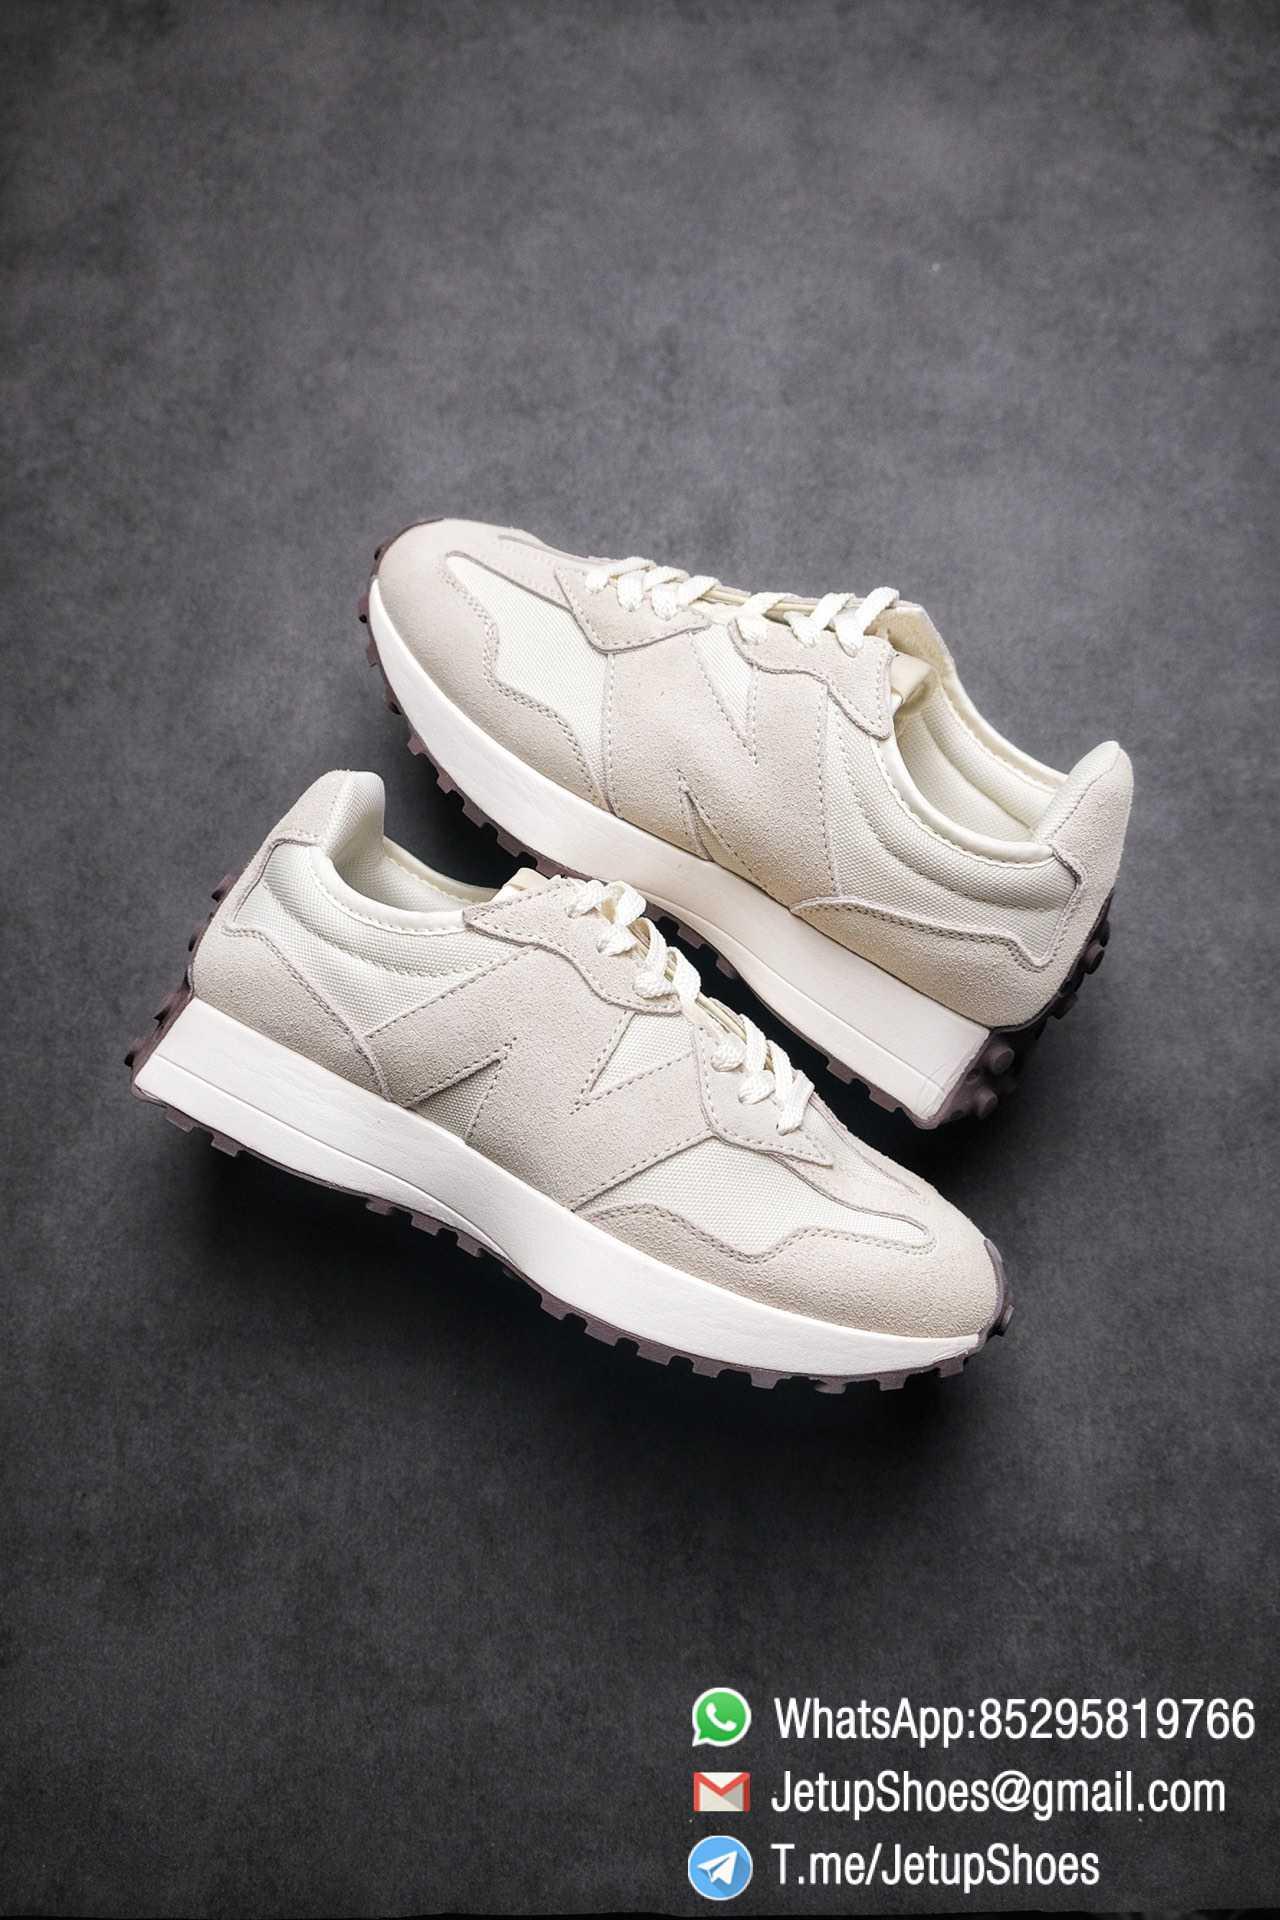 Replica Sneakers New Balance 327 Noritake x 327 Light Grey White Mesh Quarter Suede Upper Retro Running Shoes SKU WS327FB 01